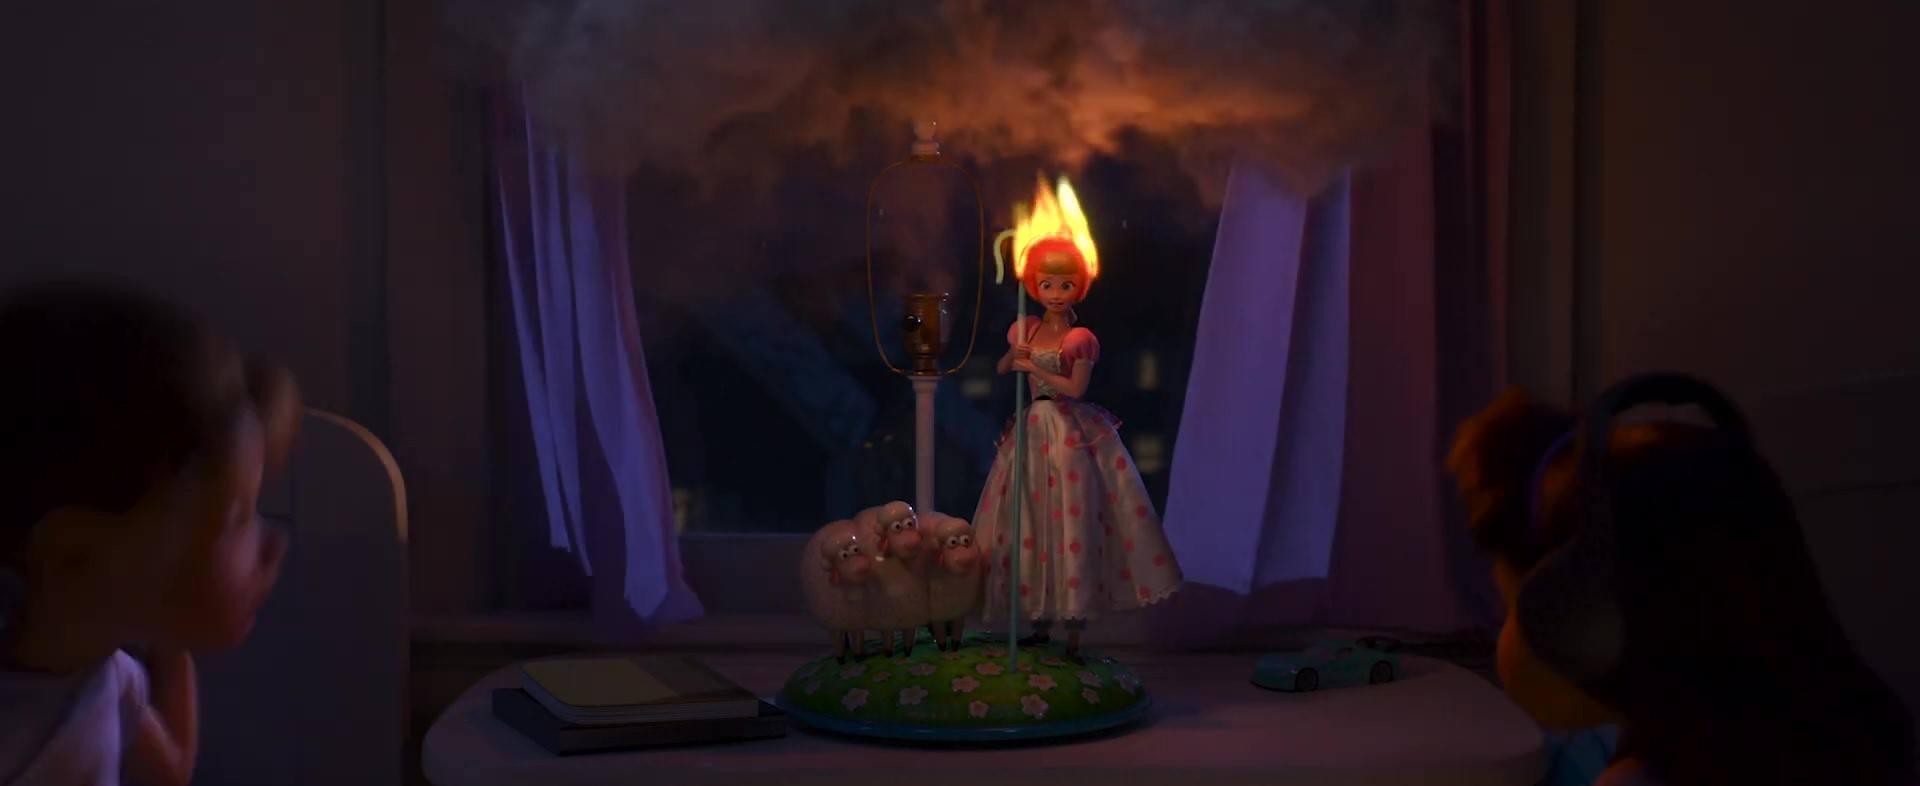 image lamp life vie lumière disney pixar